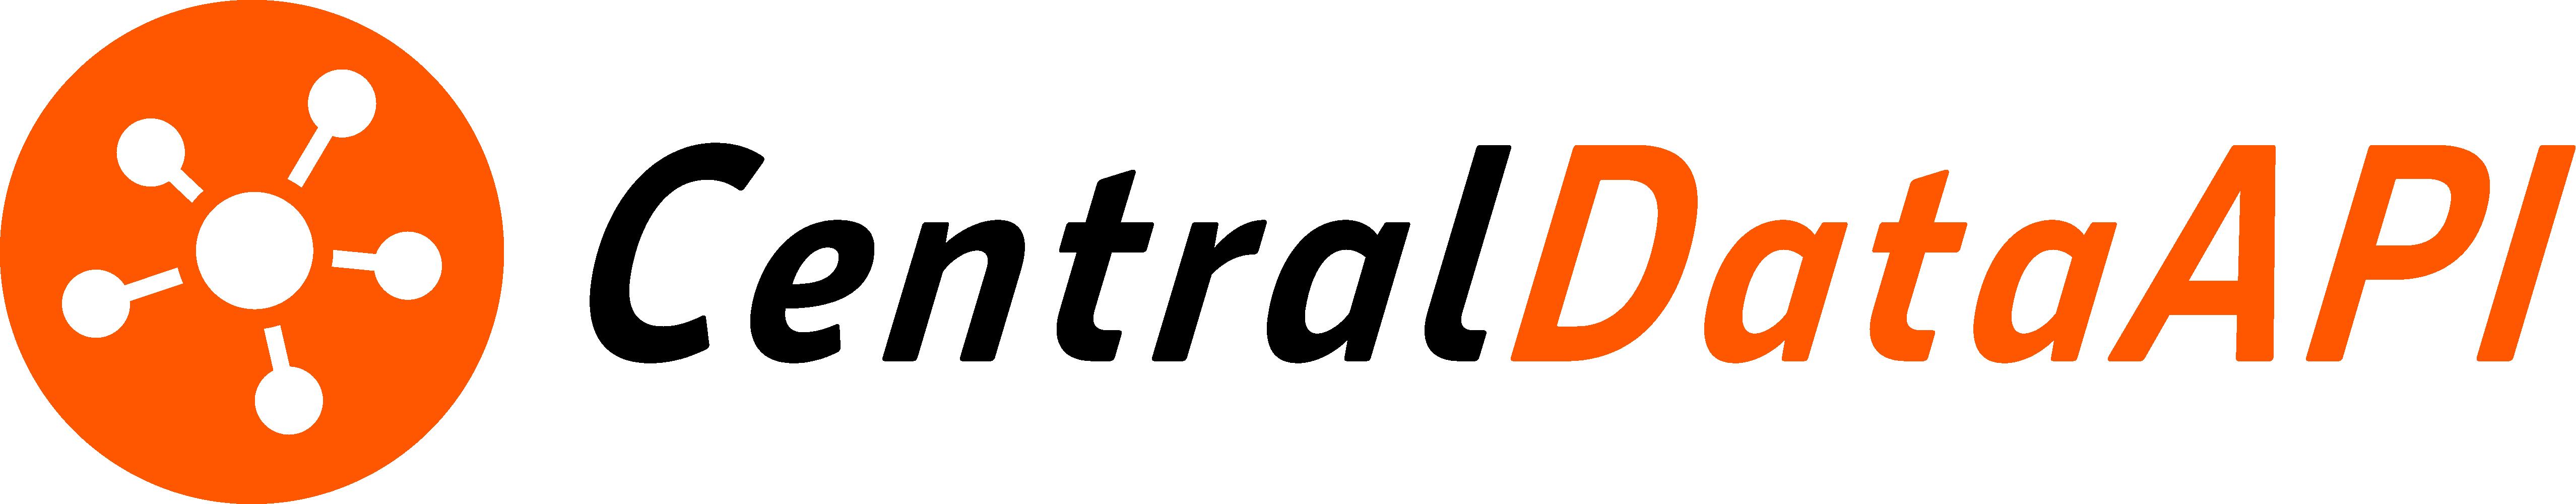 Central Data API